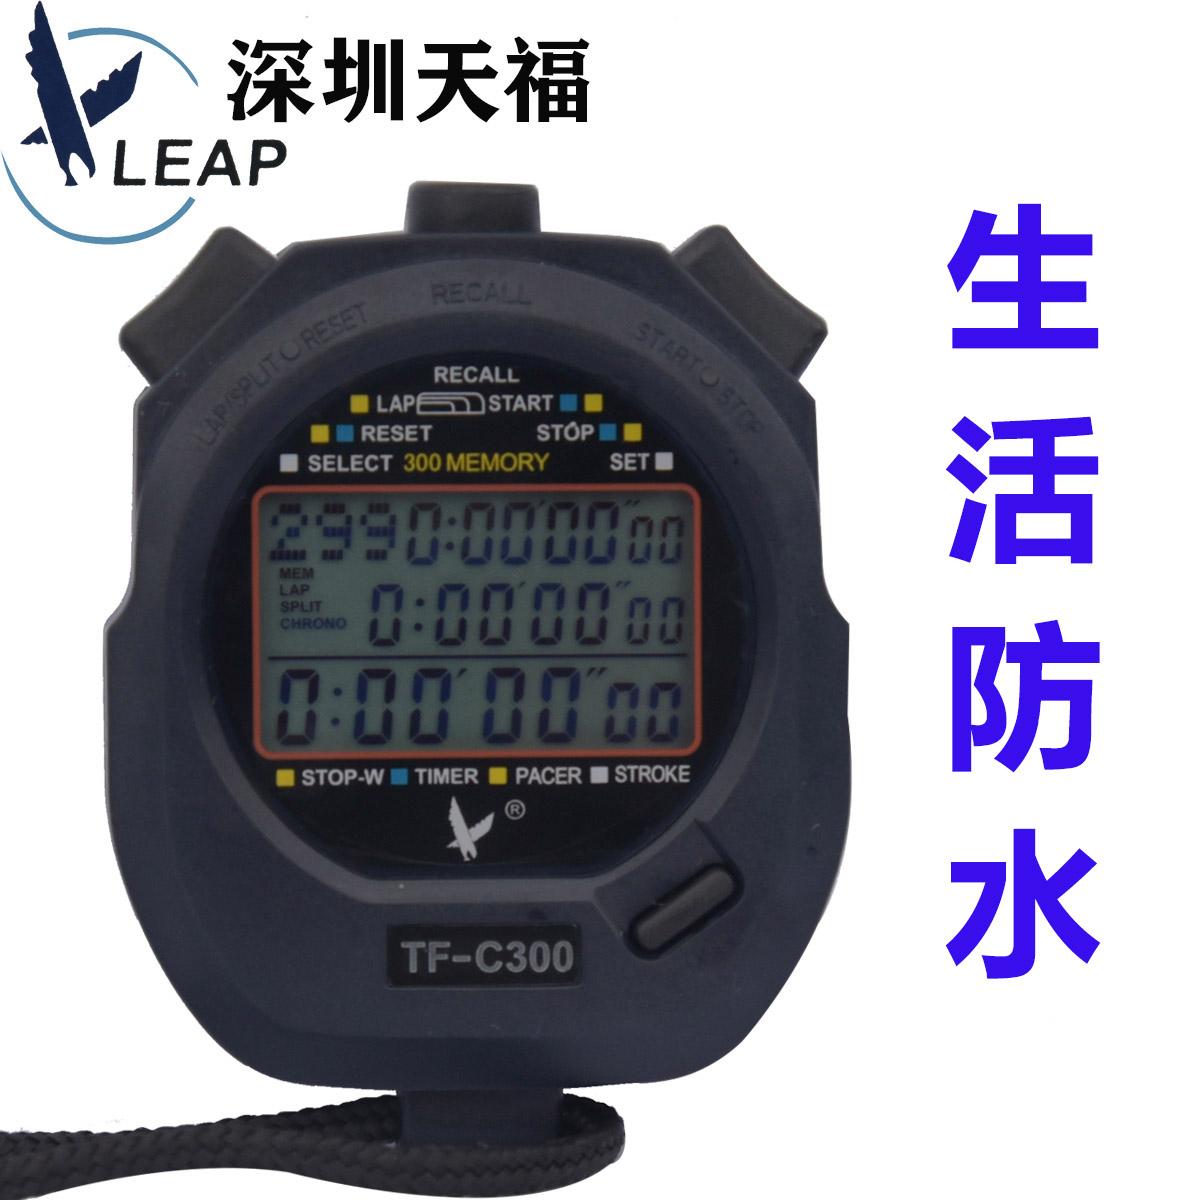 New Tianfu tf-c300 channel memory stopwatch electronic timer swimming stopwatch waterproof paddle meter